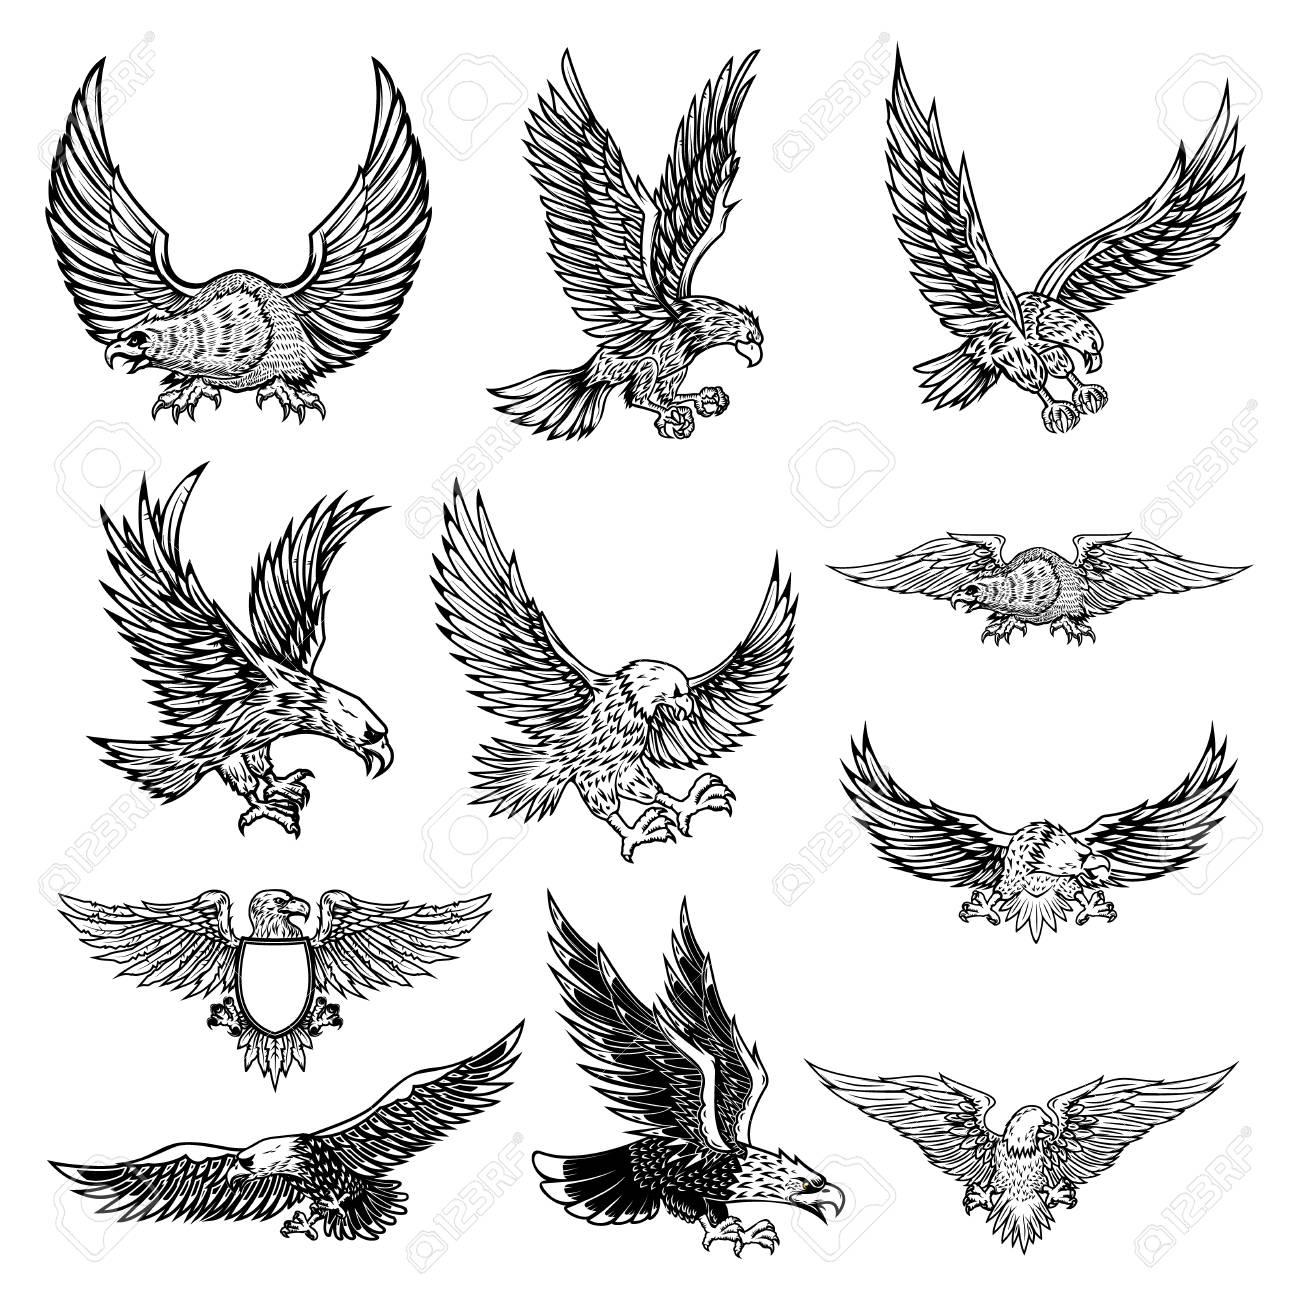 Illustration of flying eagle isolated on white background. Vector illustration. - 110123135